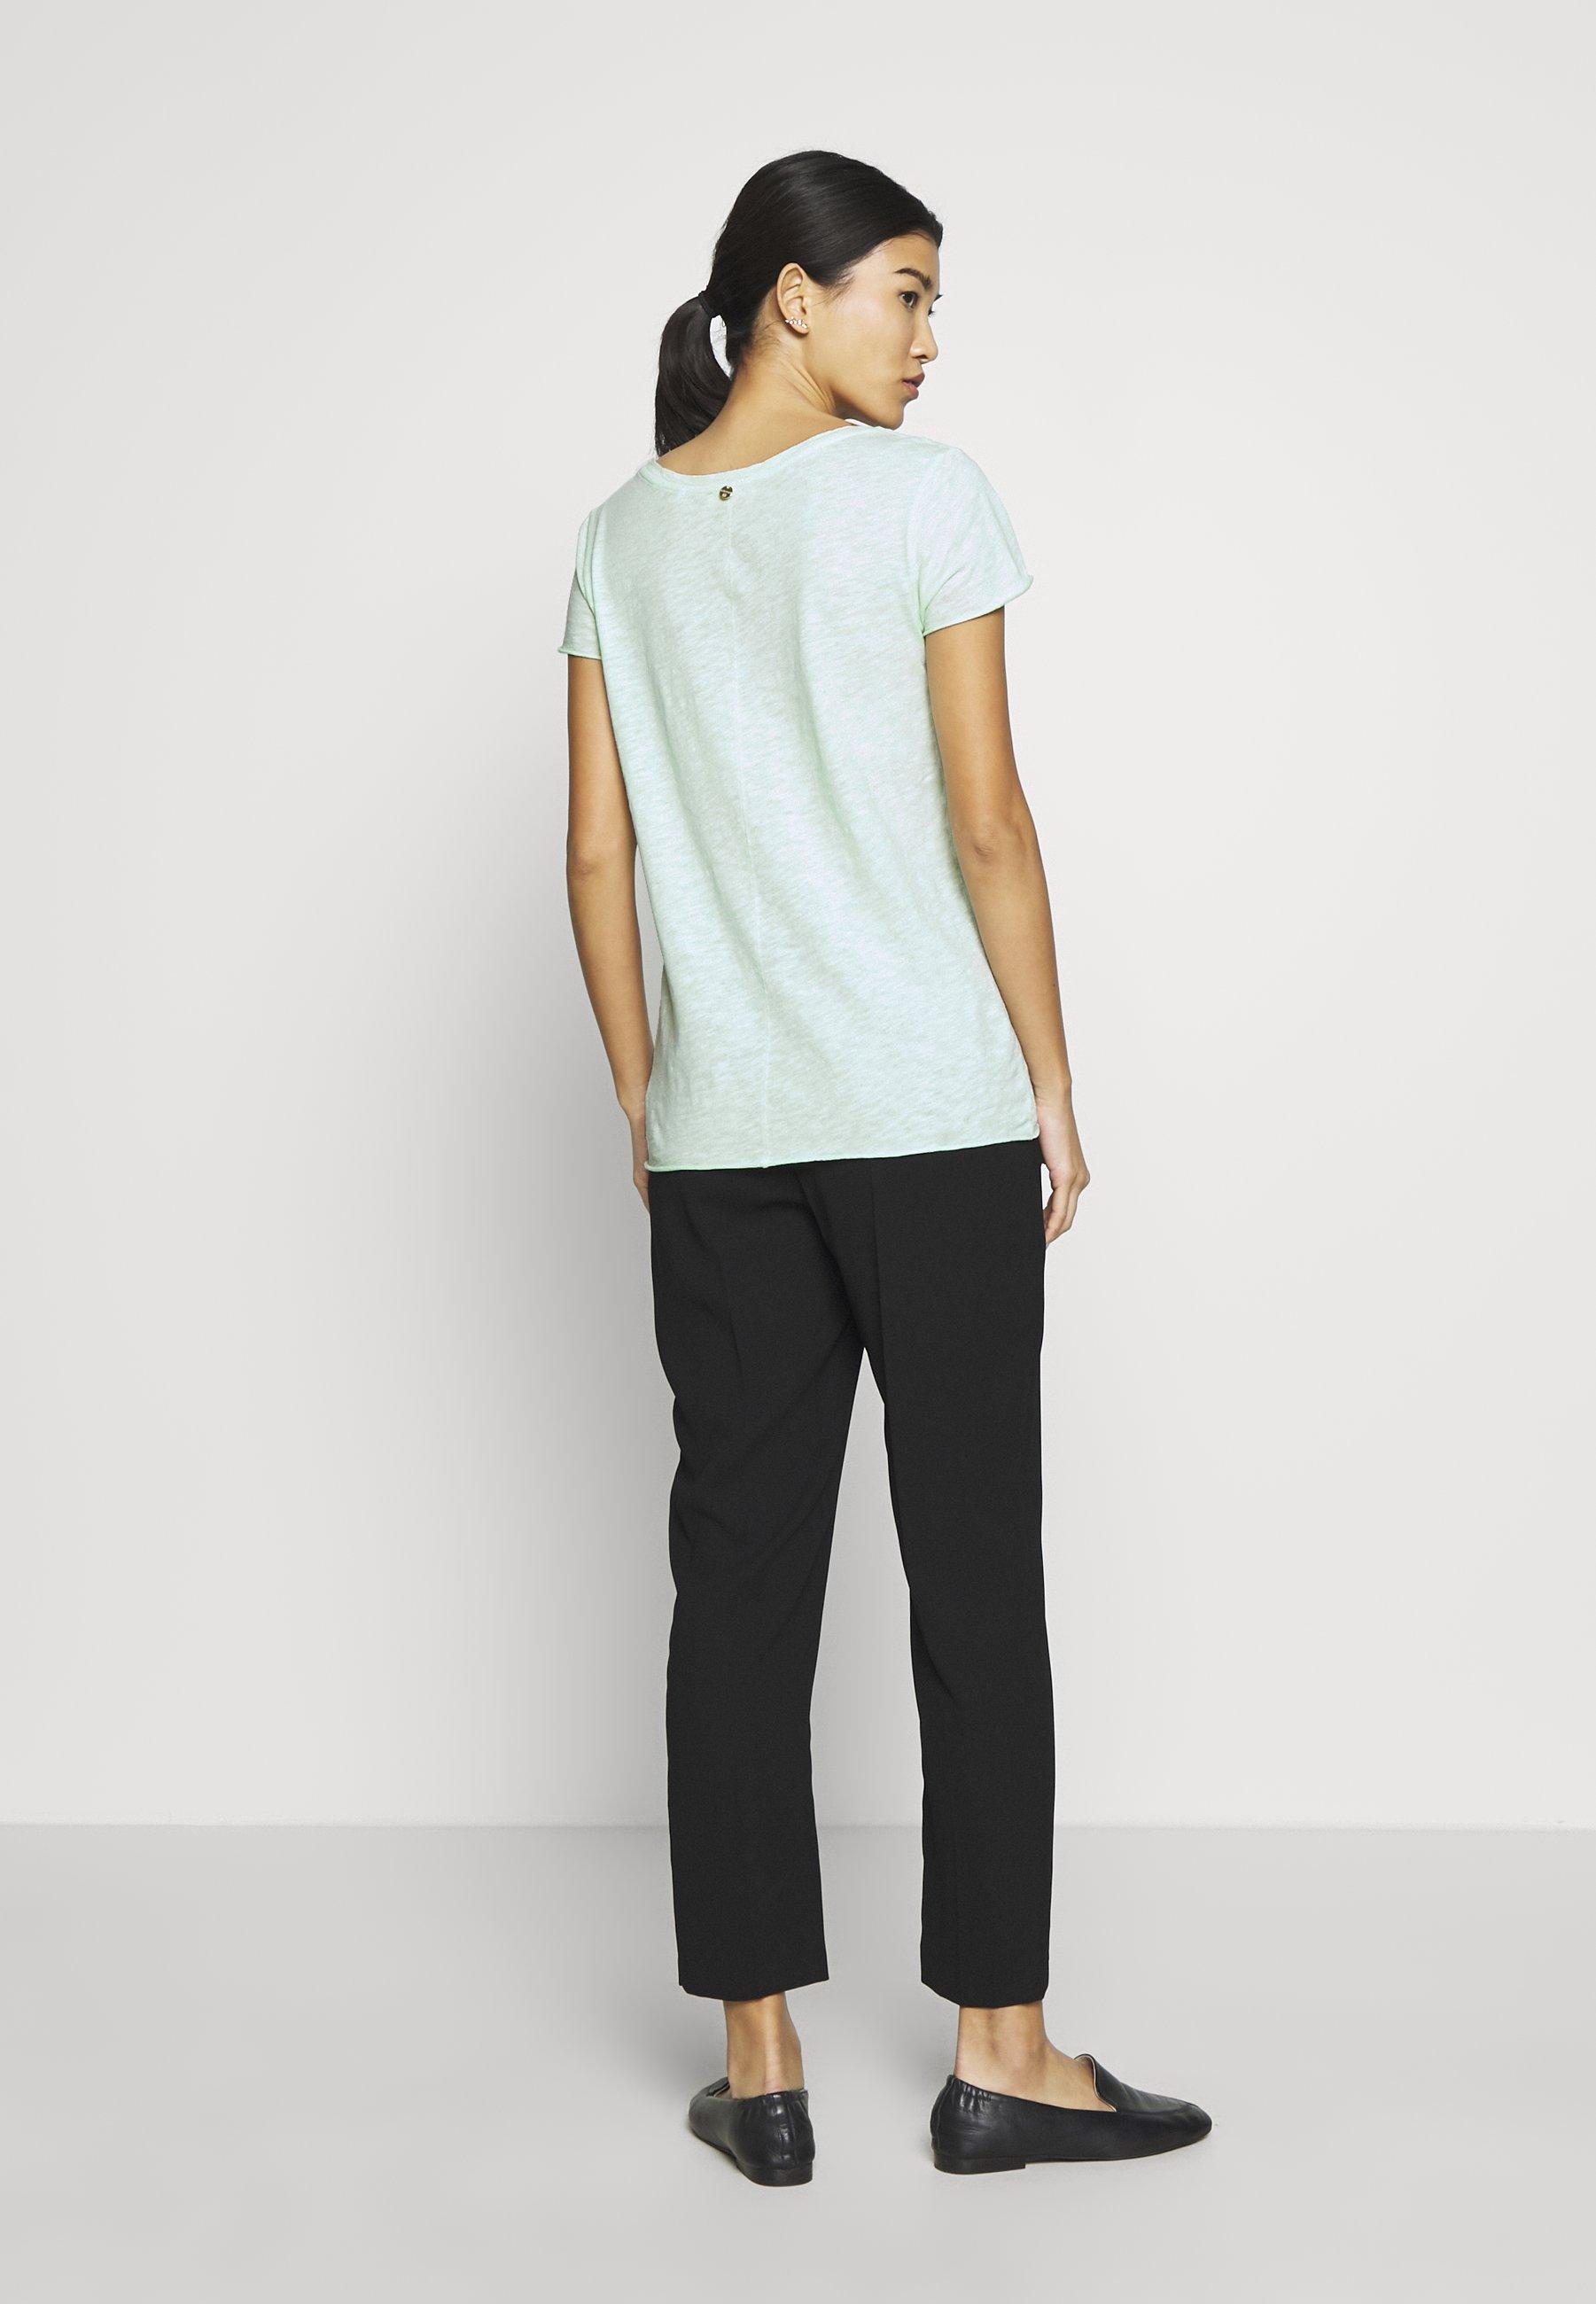 Rich & Royal T-shirts - jade mint